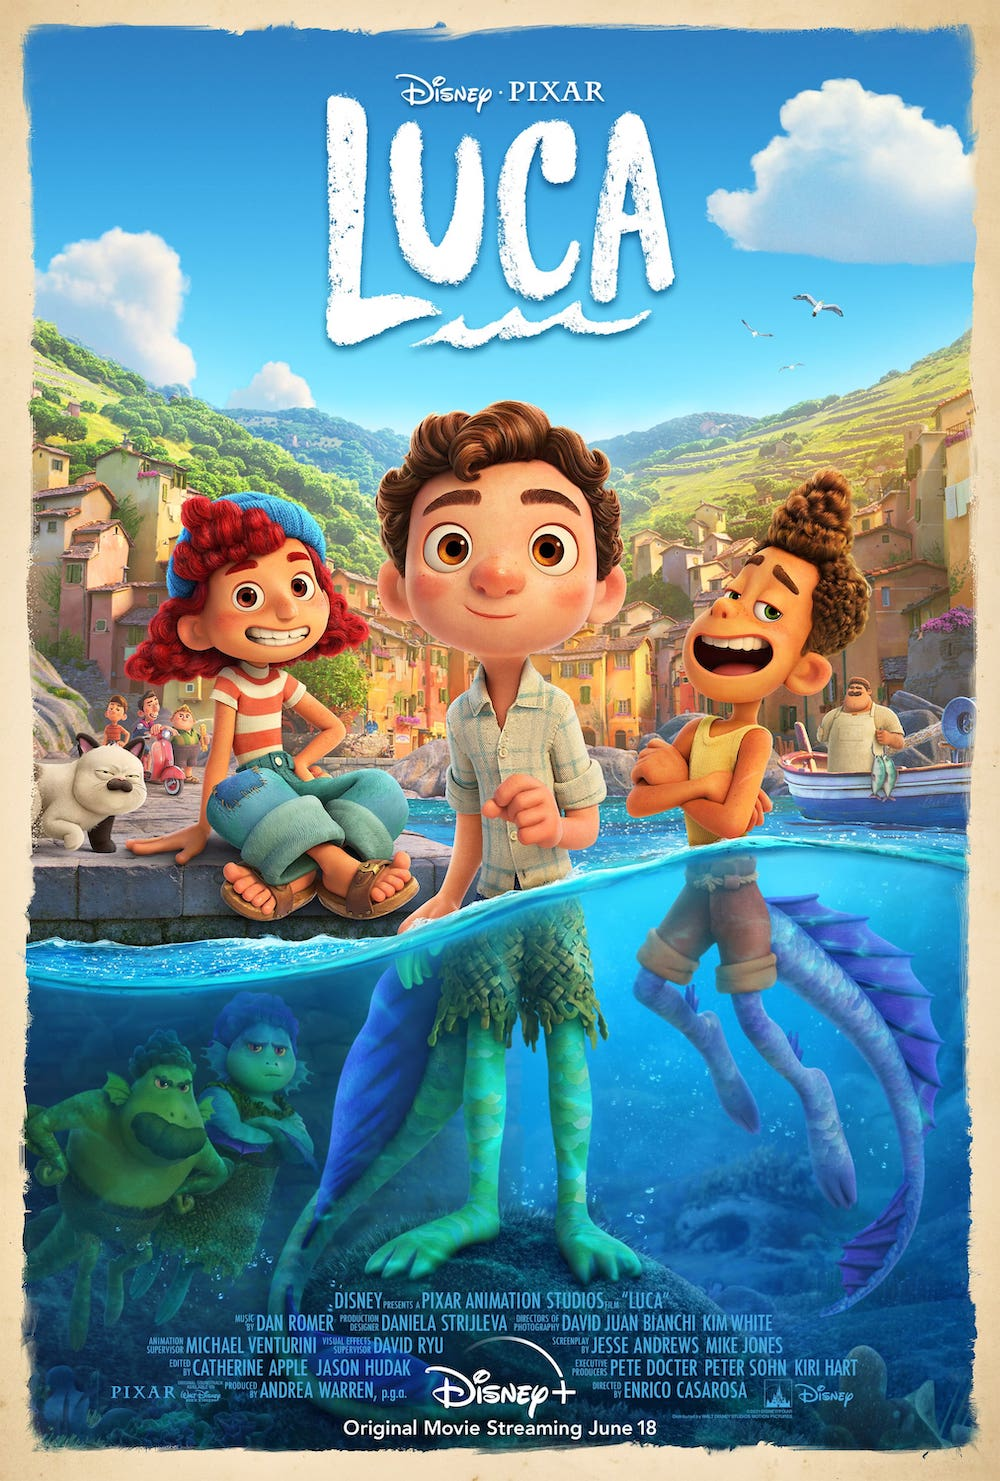 PIxar's Luca Poster © 2021 Disney/Pixar. All Rights Reserved.